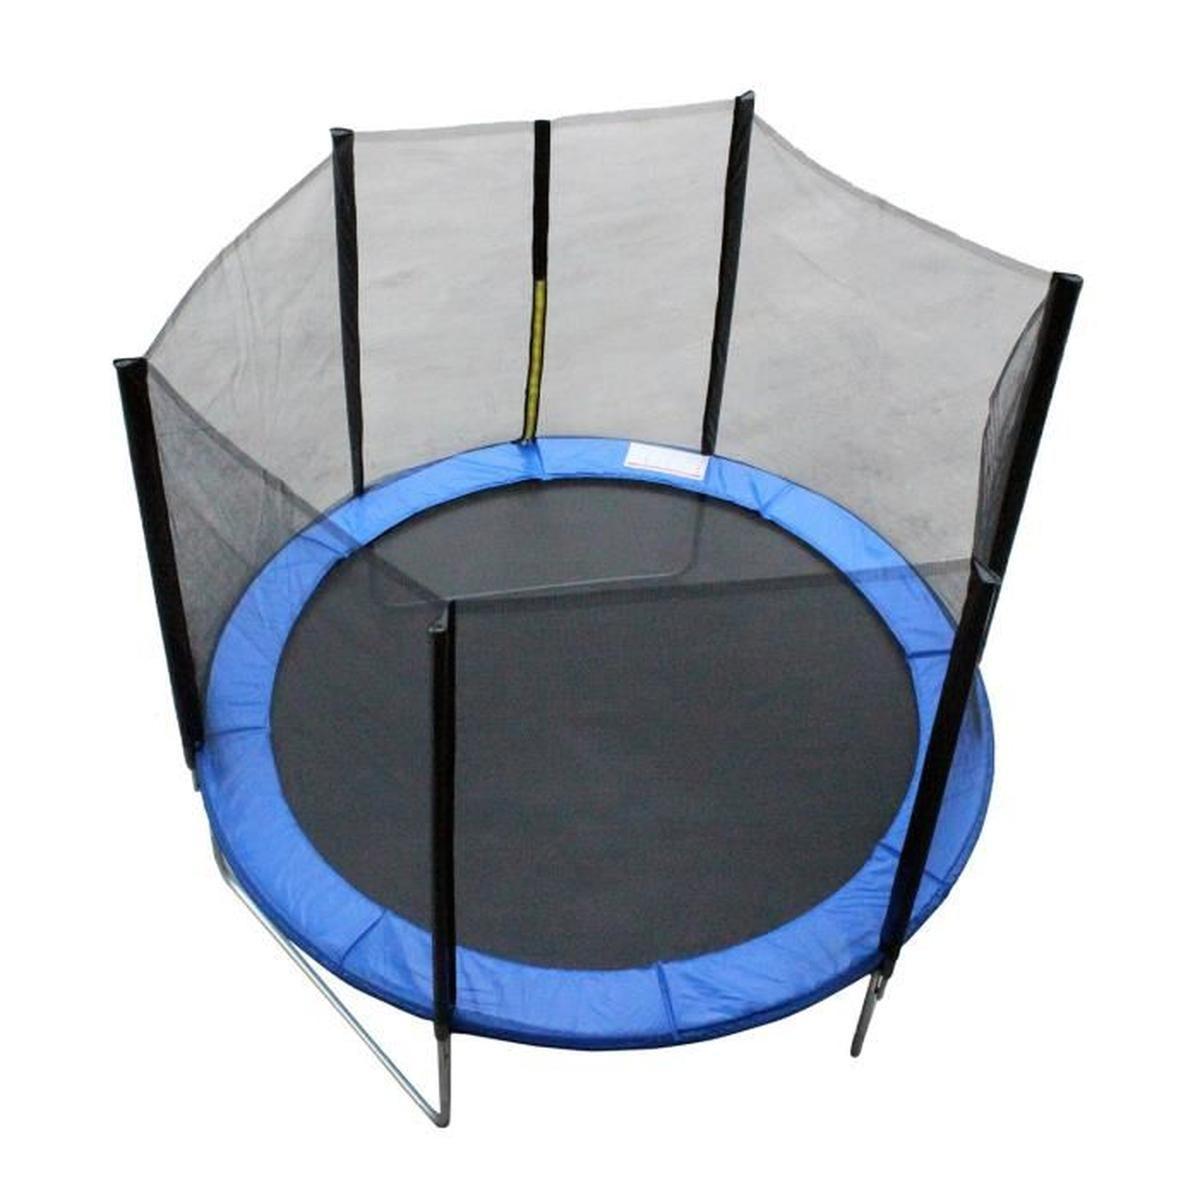 Trampoline Concept Usine concernant Trampoline Habitat Et Jardin